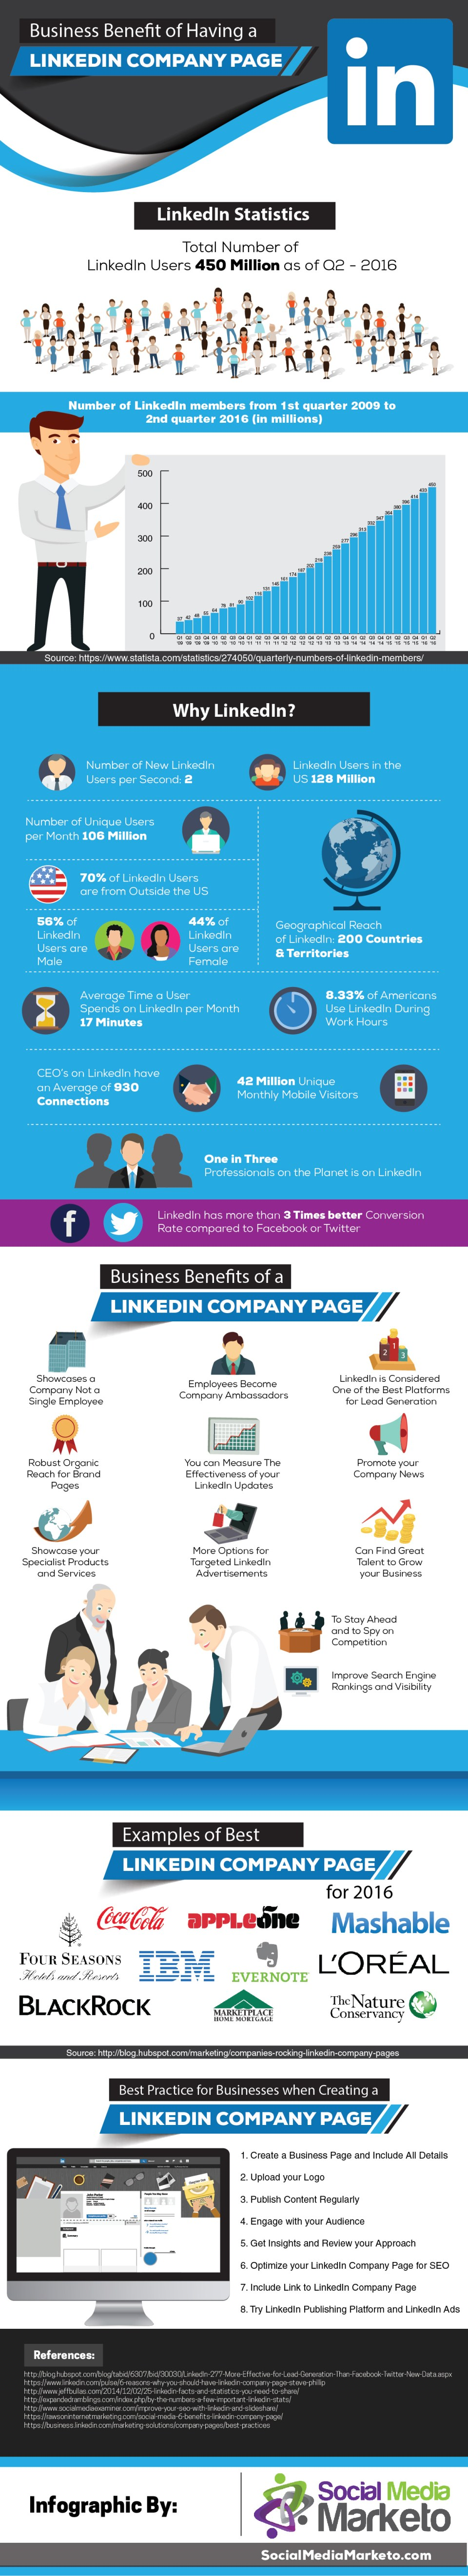 LinkedIn-Company-Page-Infographic.jpg